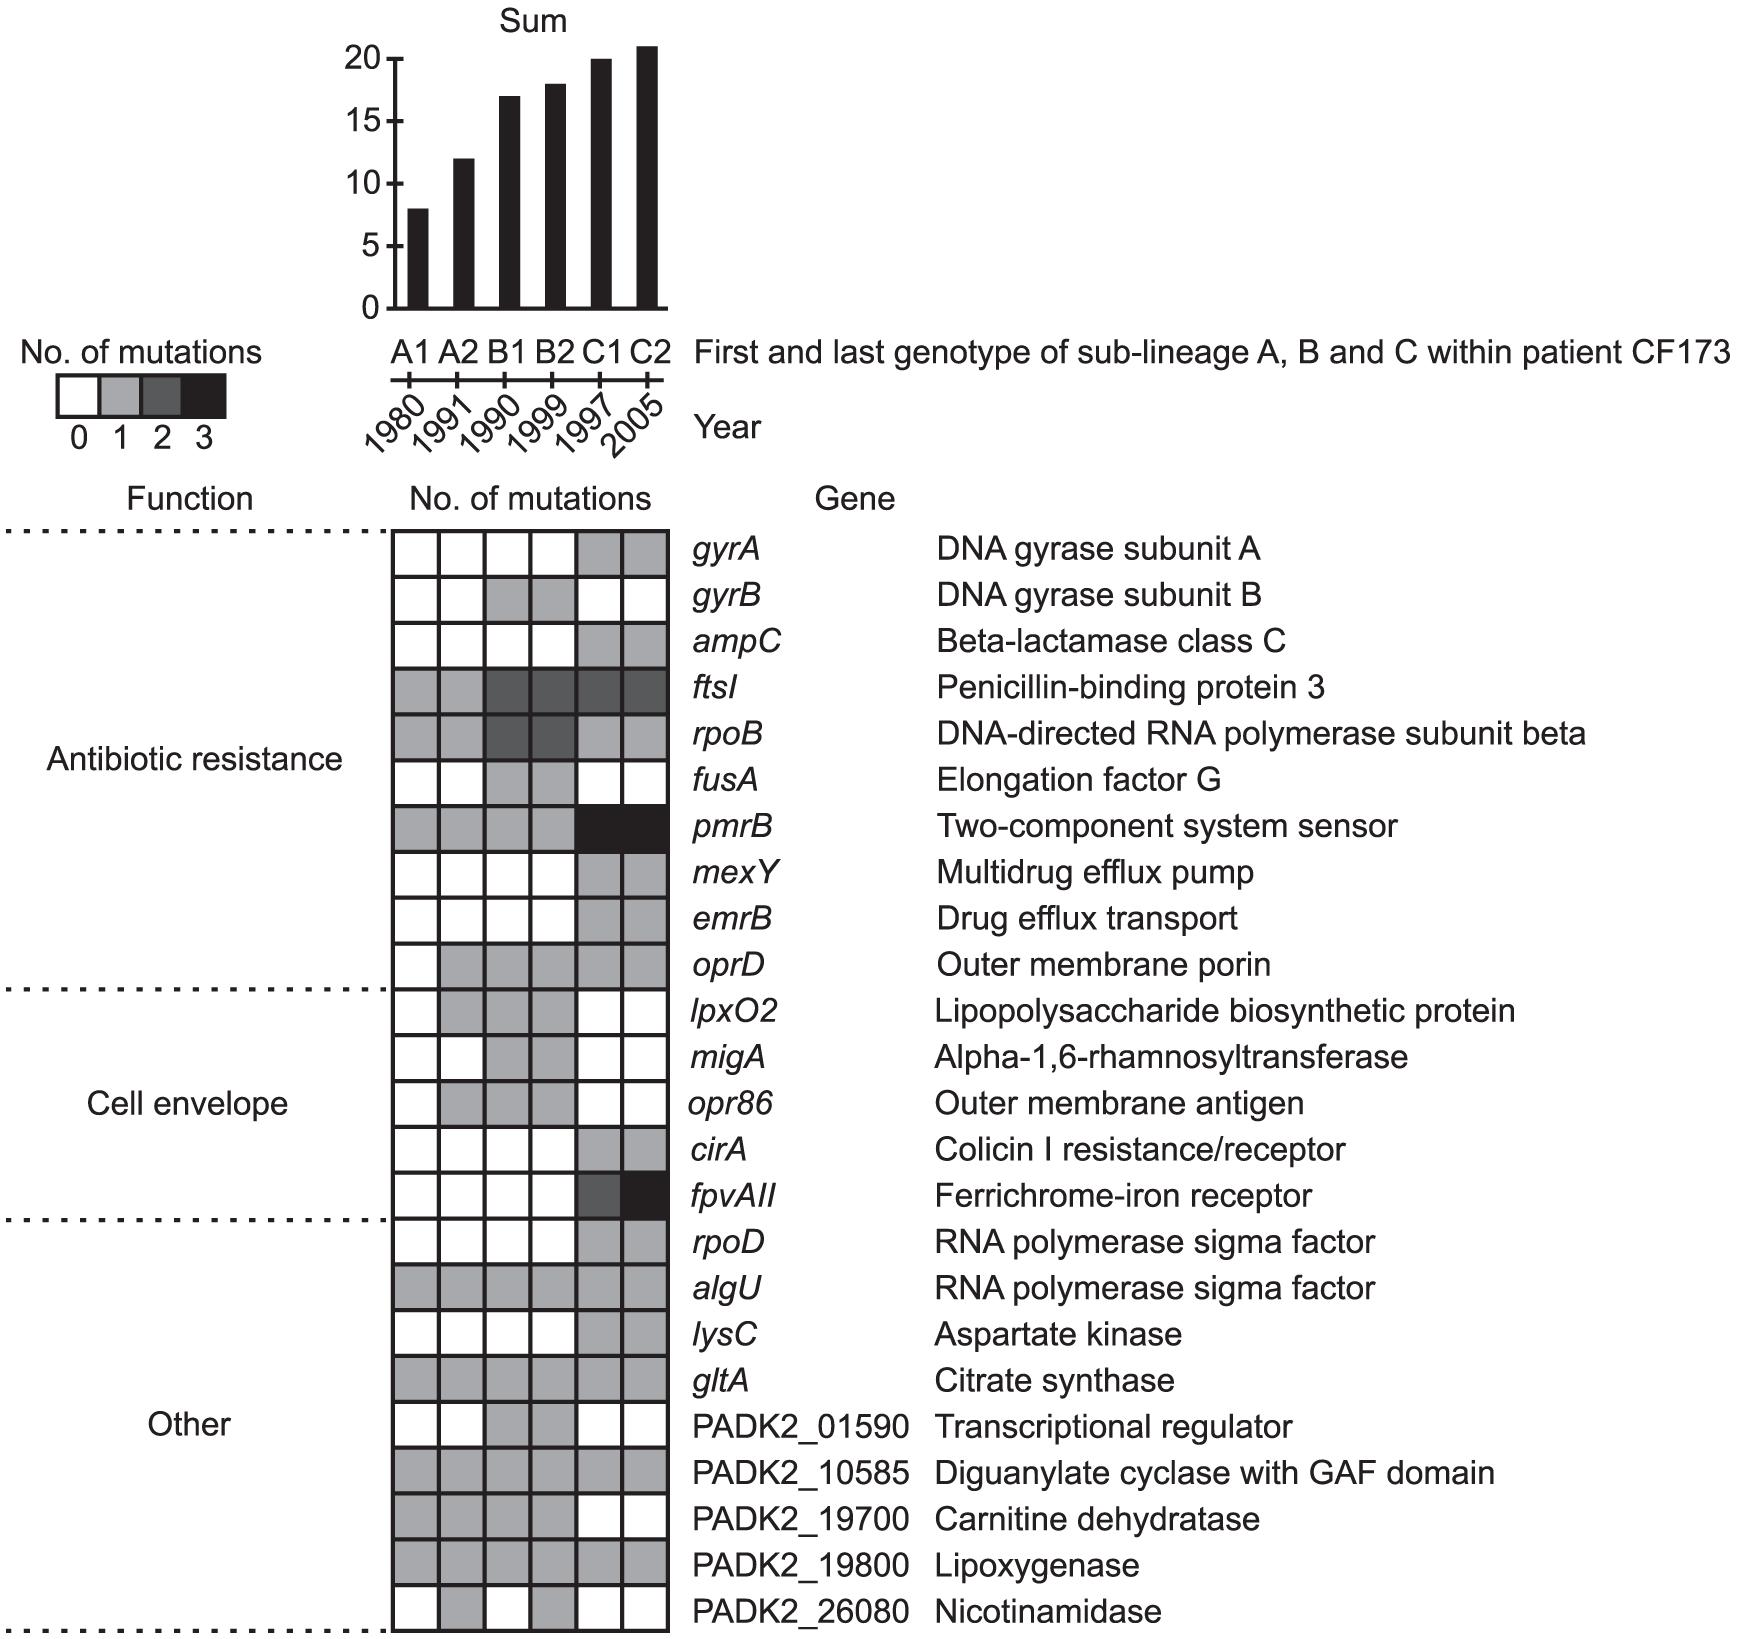 Pathoadaptive genes.